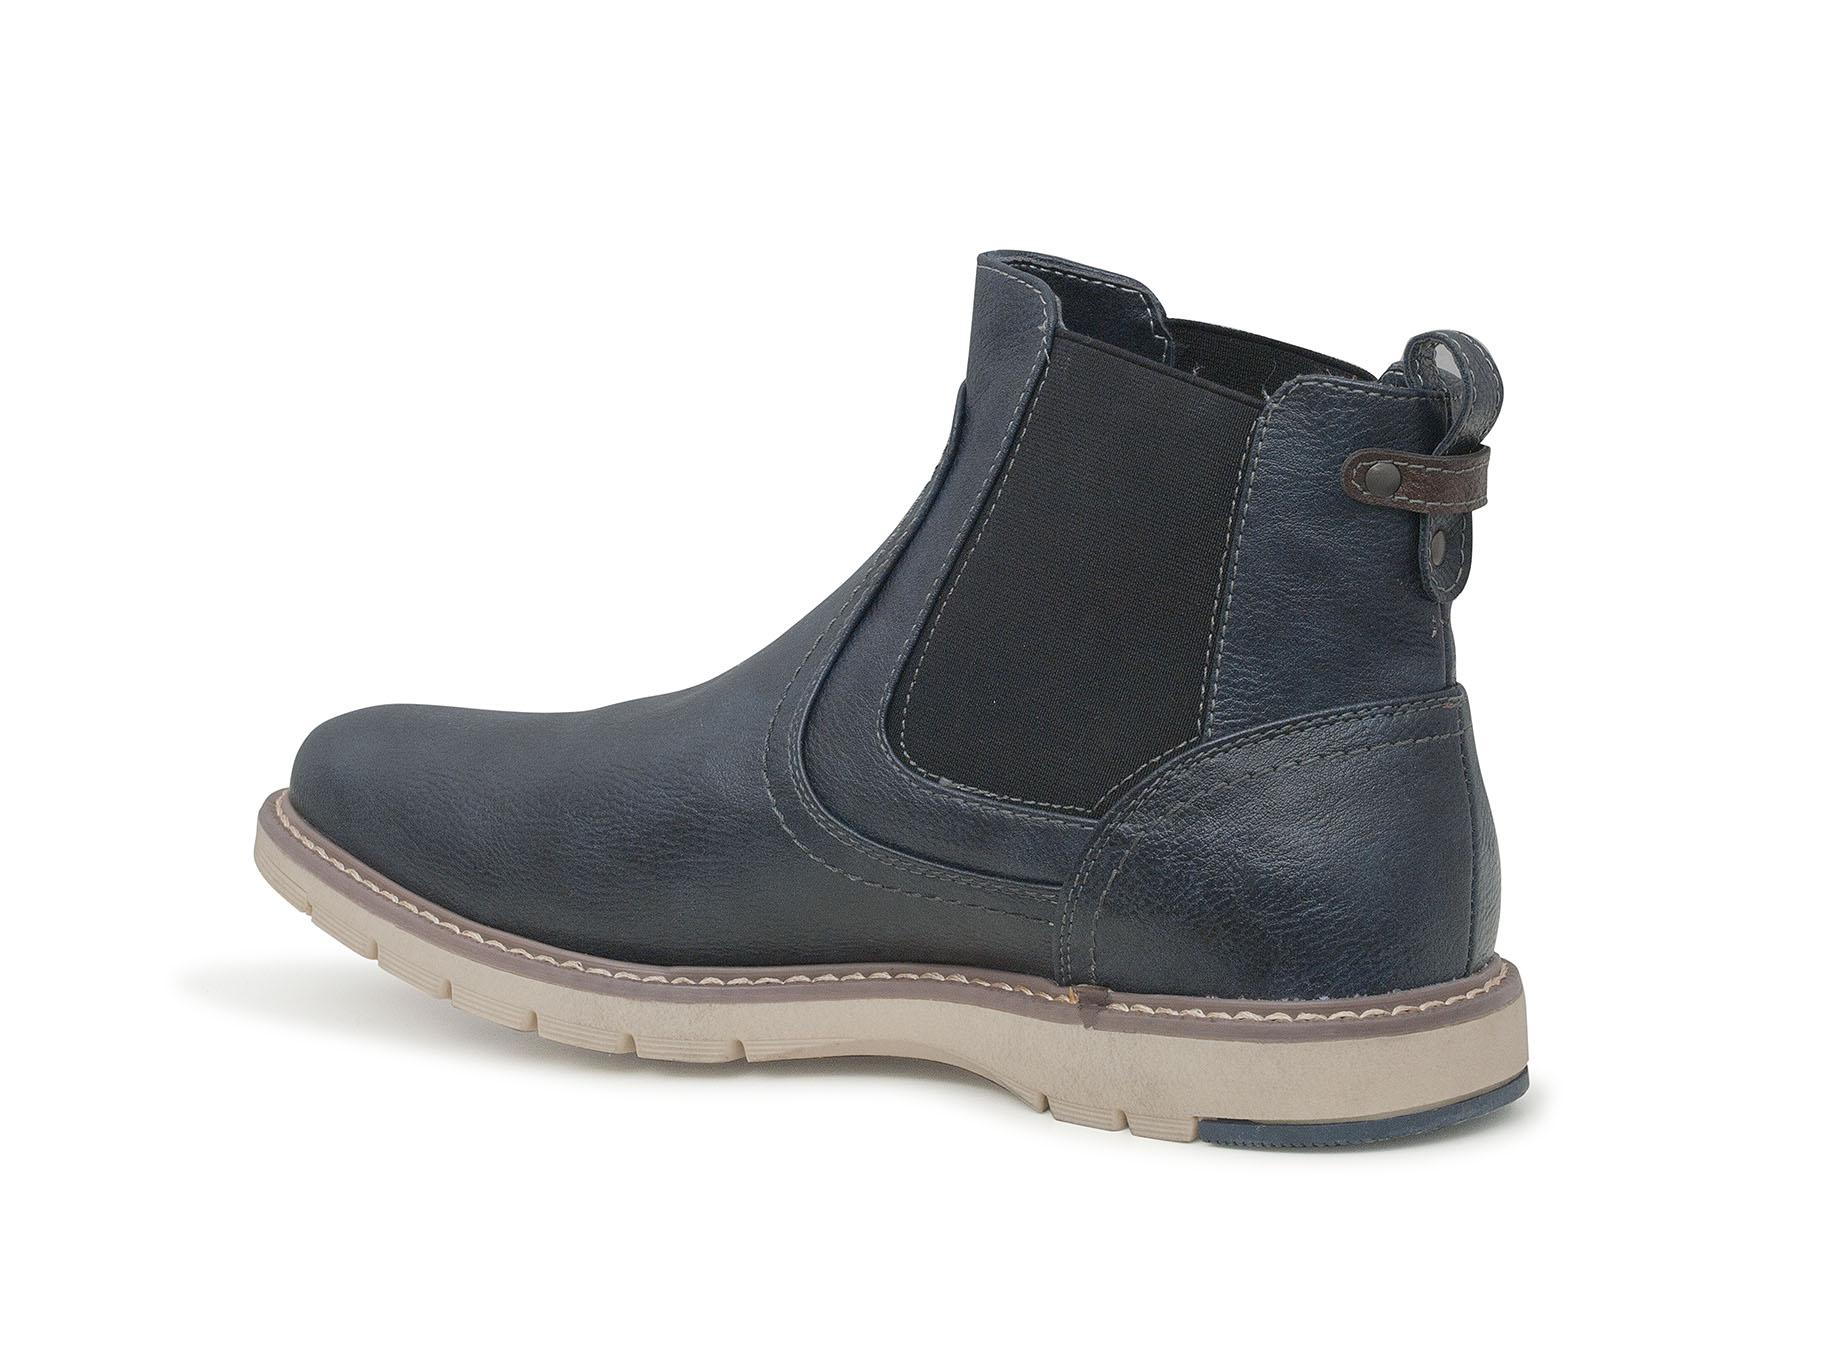 7950f2e0af ... Mustang boty shoes buty schuhe topánky chaussure cipő čevlje schoenen scarpe  zapatos batai pantofi sko skor